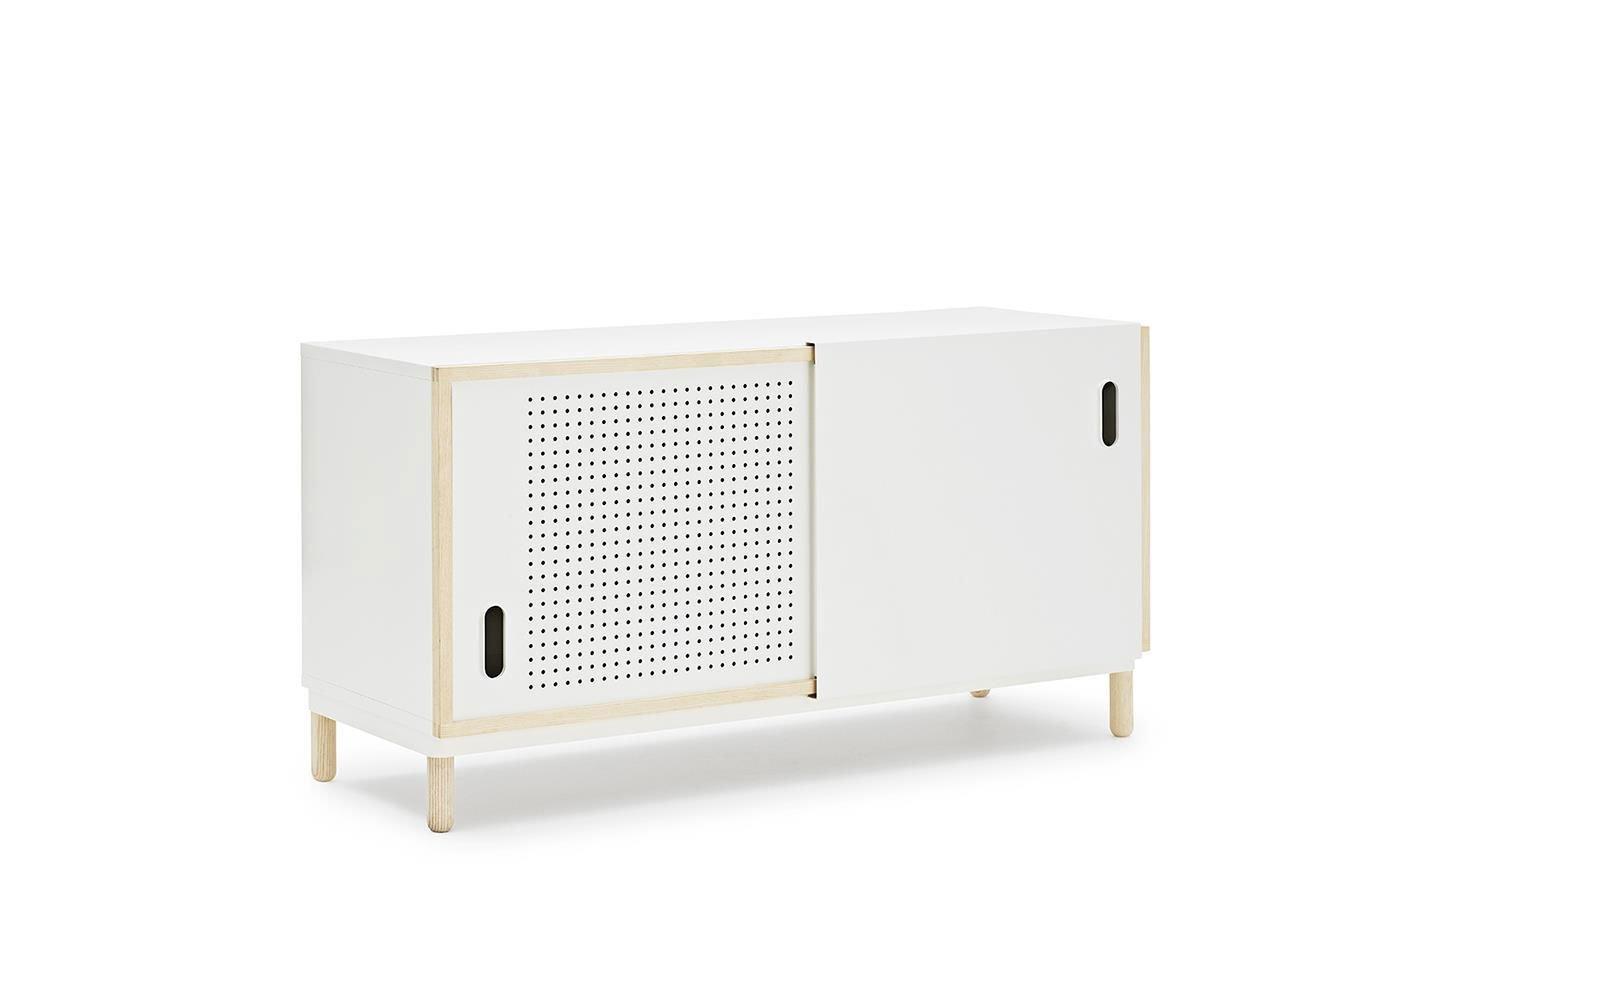 Kabino Modern Sideboard With Sliding Doors Klarityfurniture